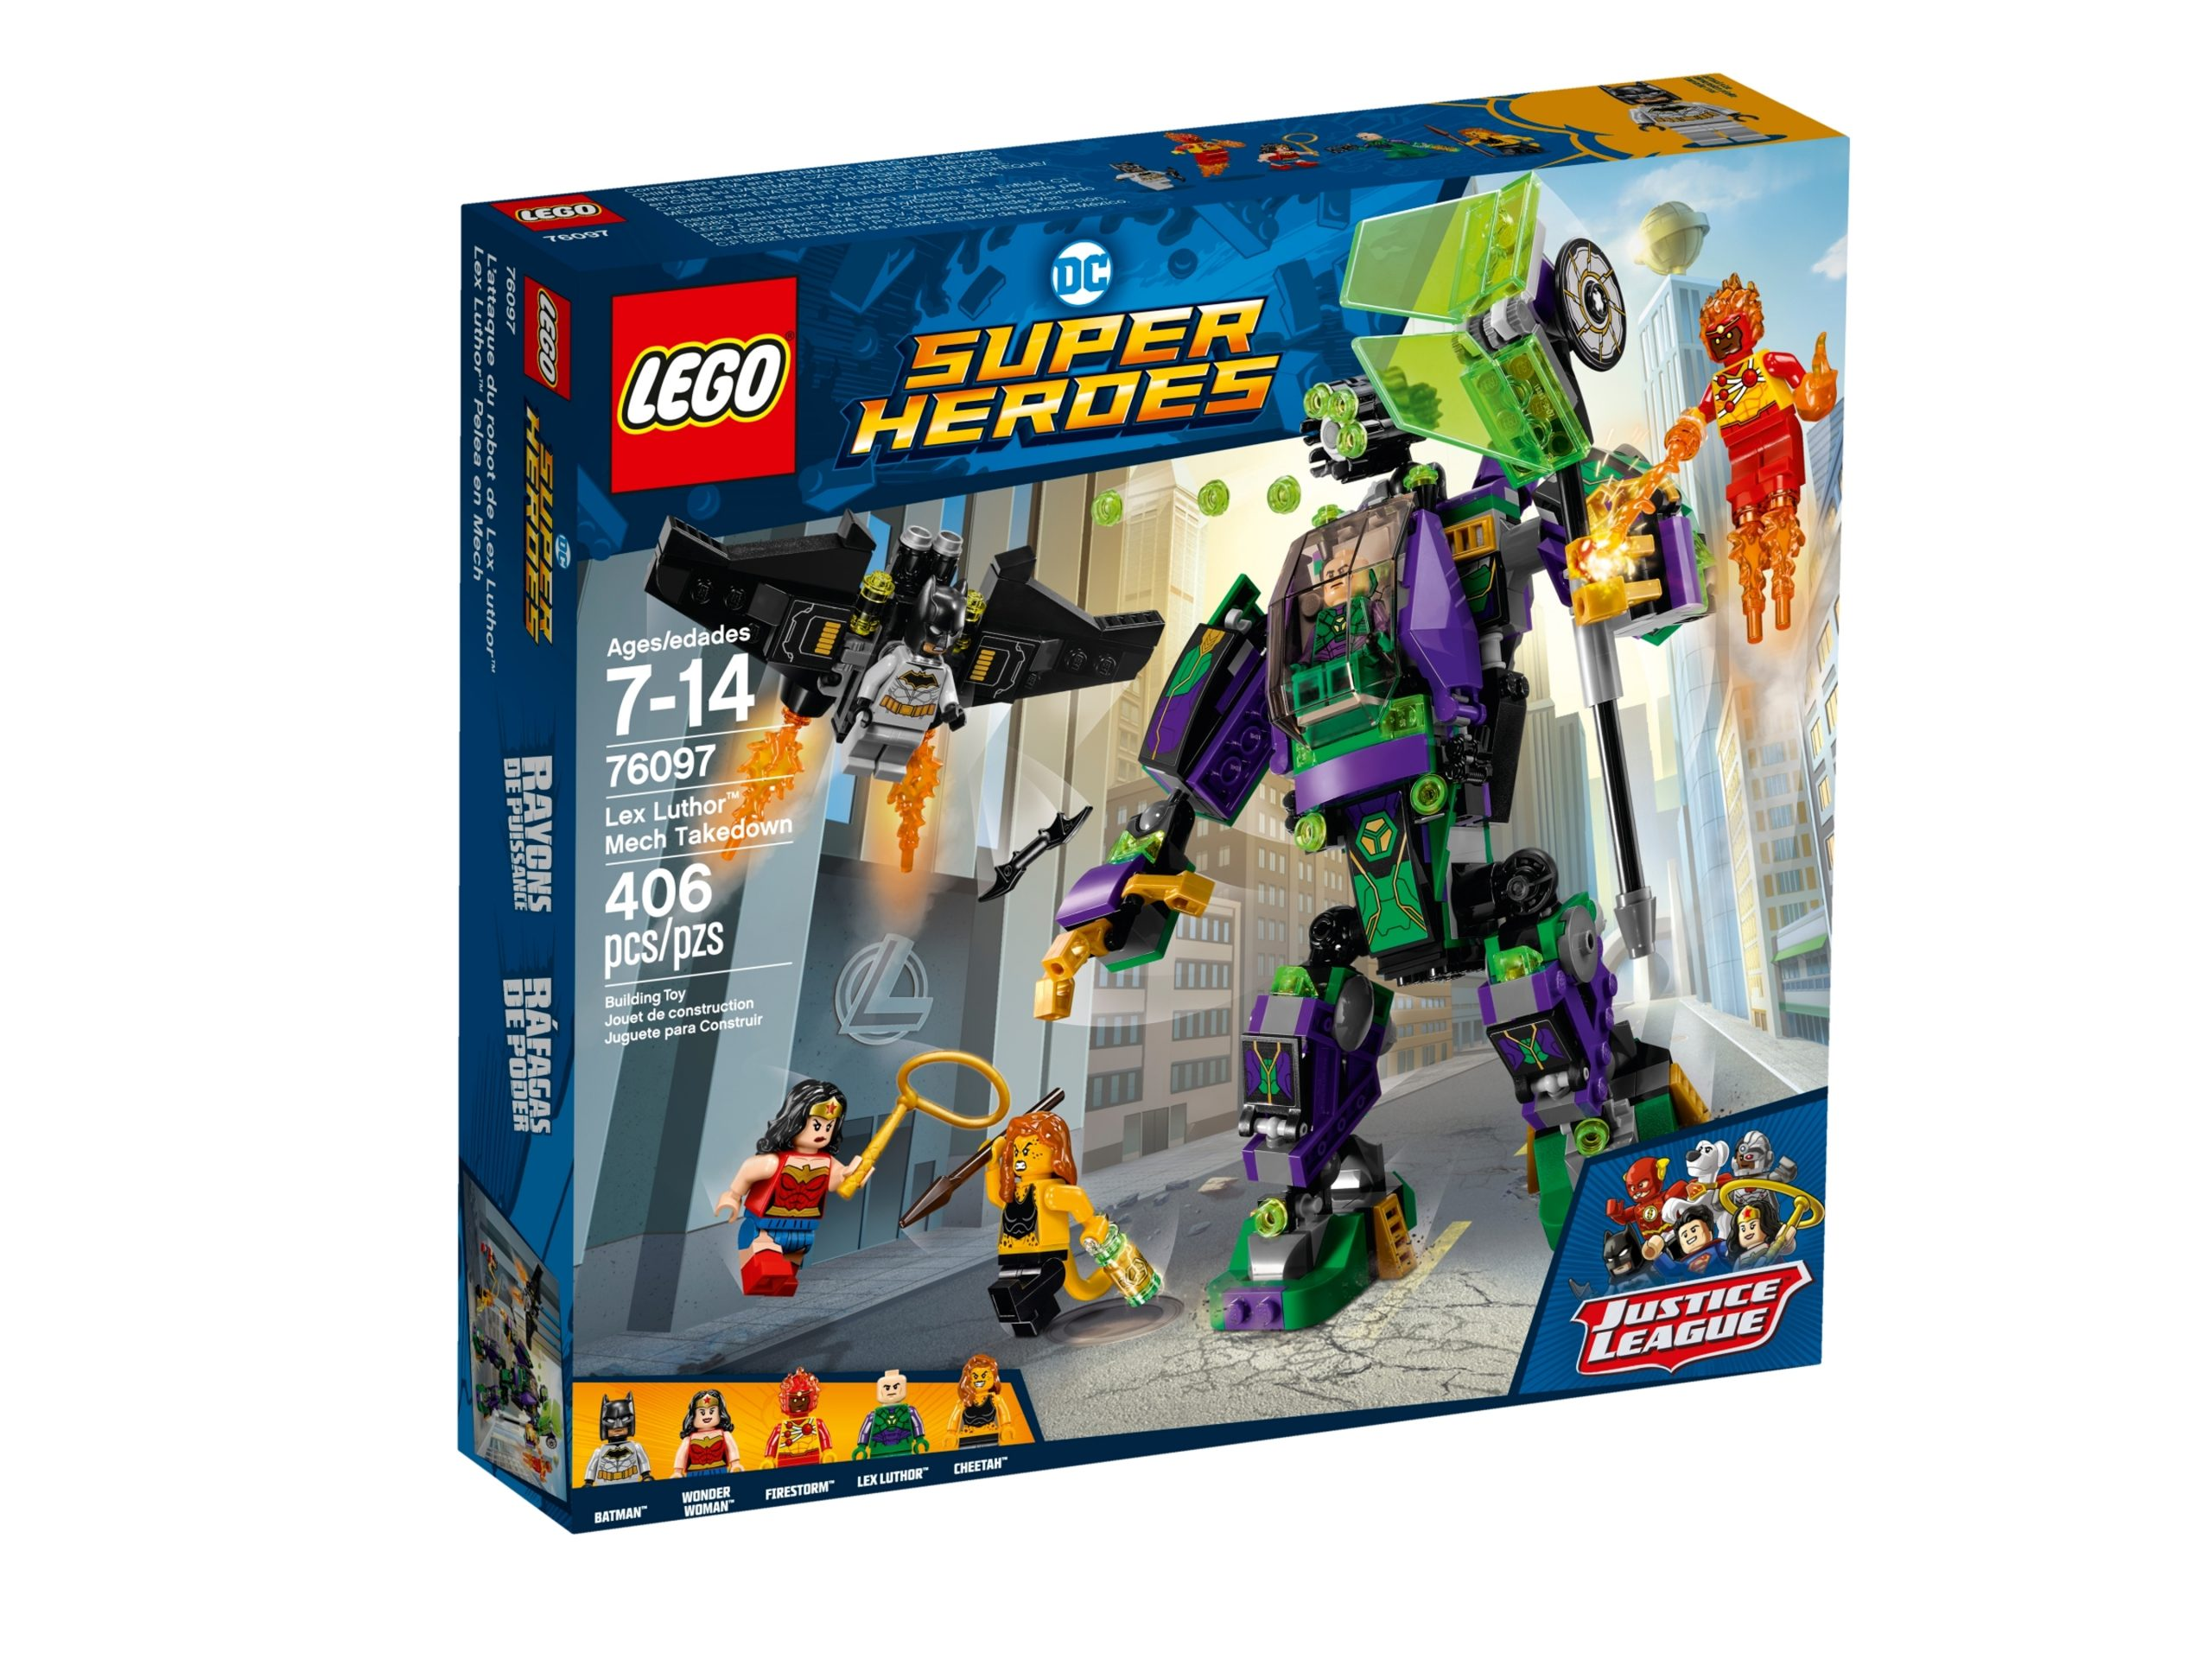 lego 76097 lex luthor mech takedown scaled